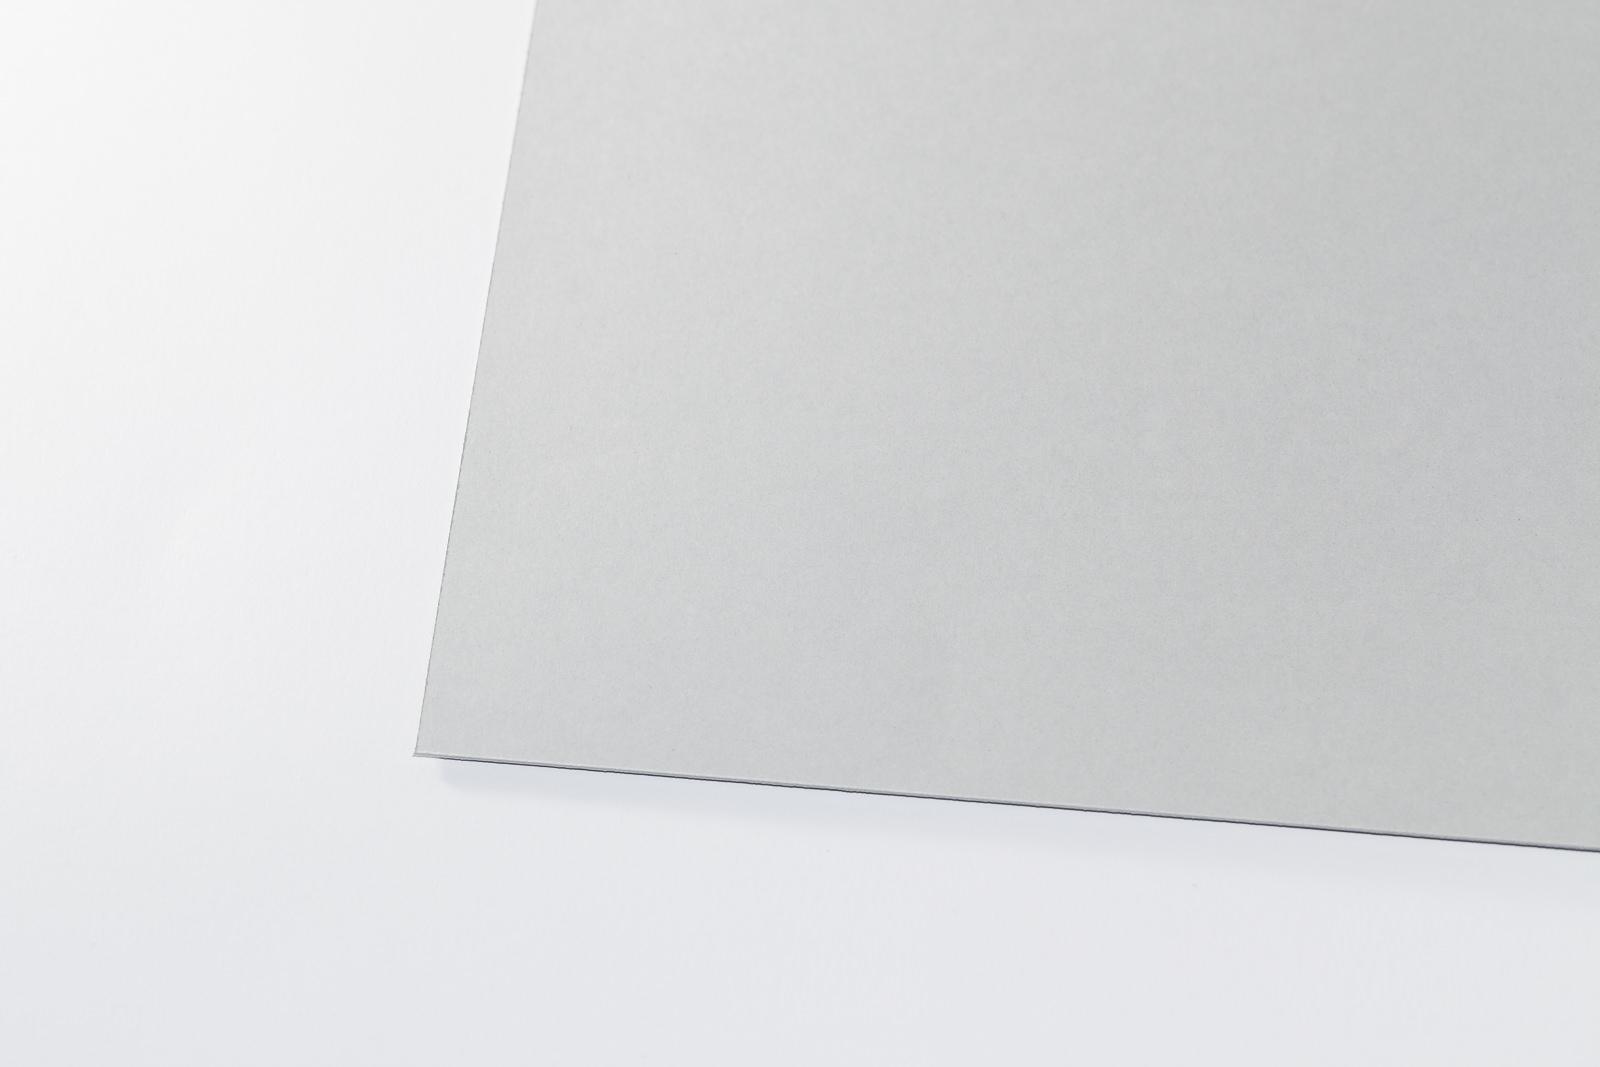 Archiv-Karton grau